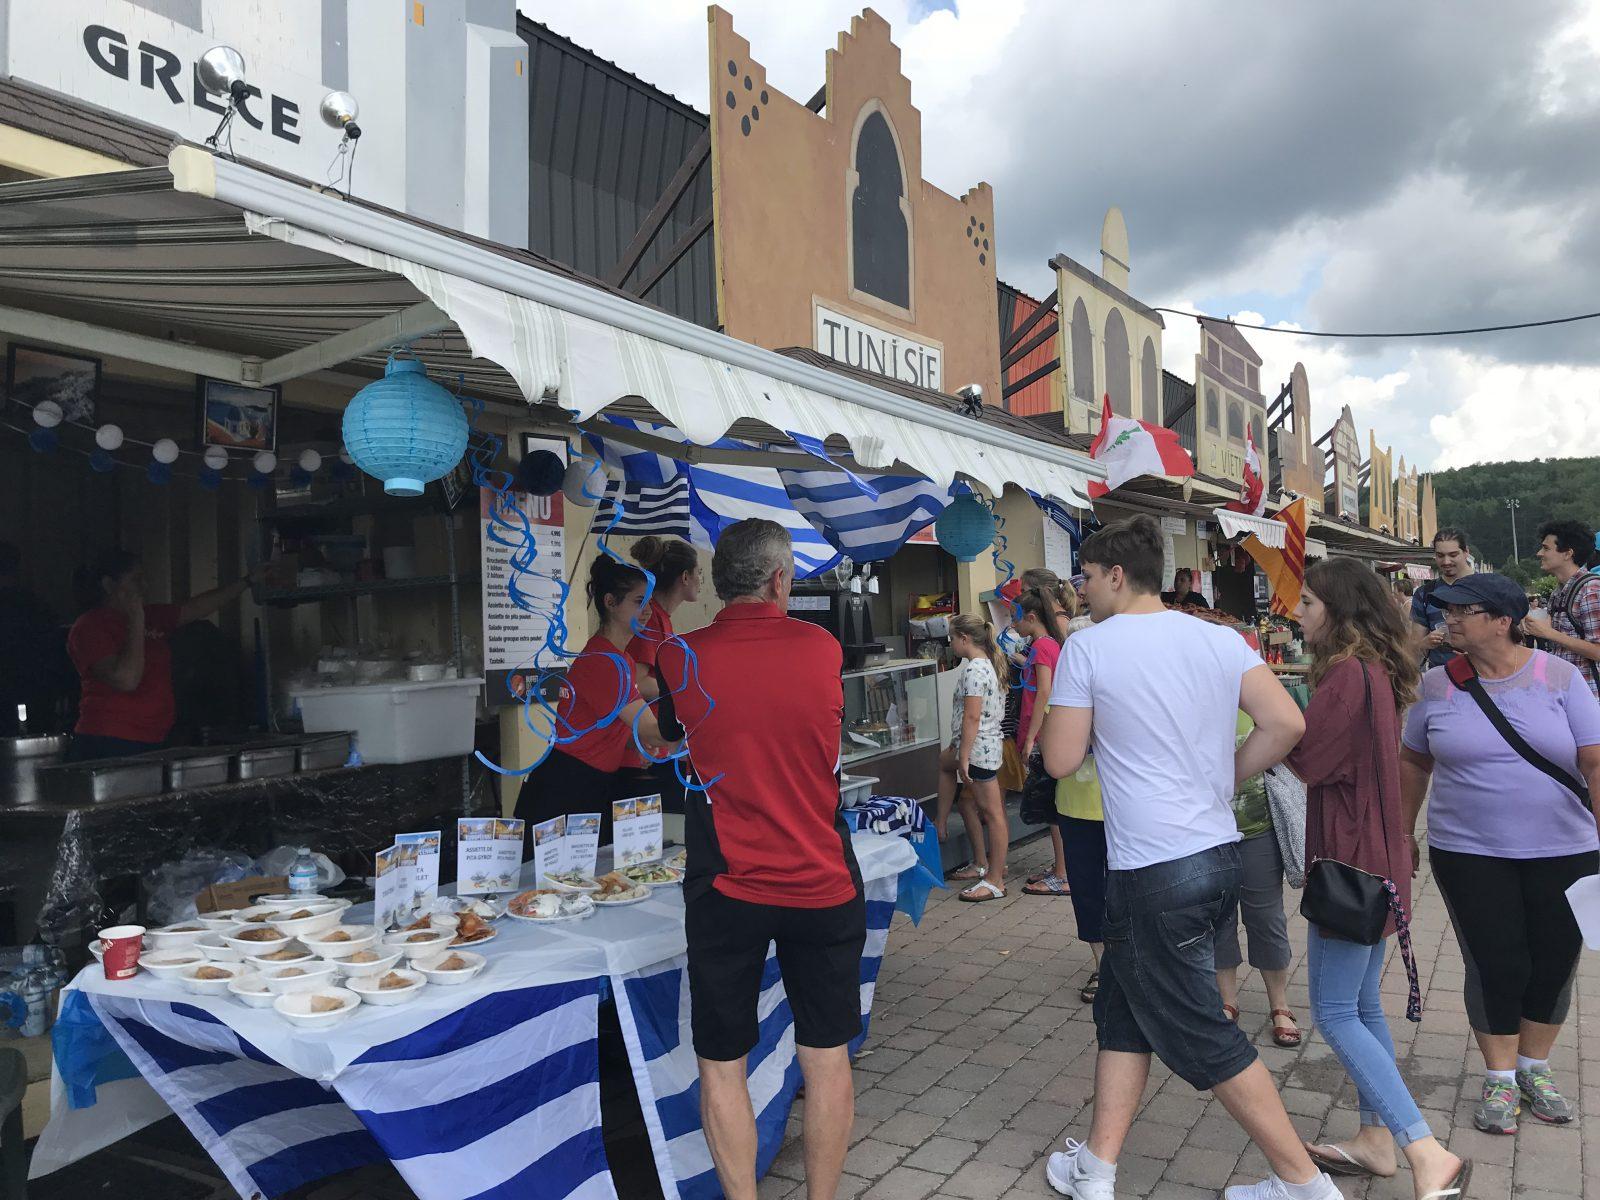 Festival des Traditions du Monde  underway in Sherbrooke